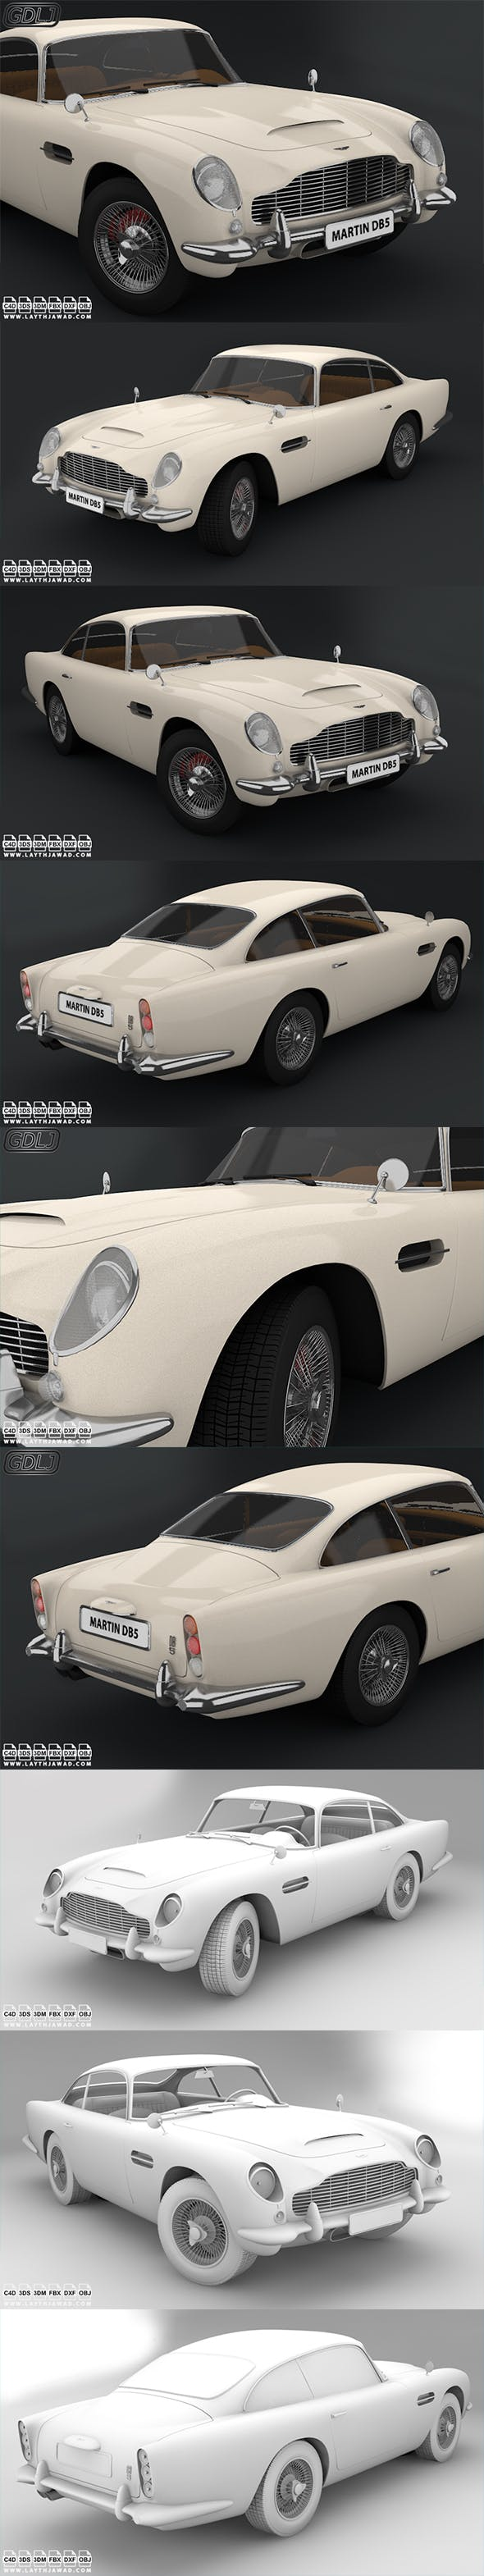 Aston Martin DB5 1964 - 3DOcean Item for Sale